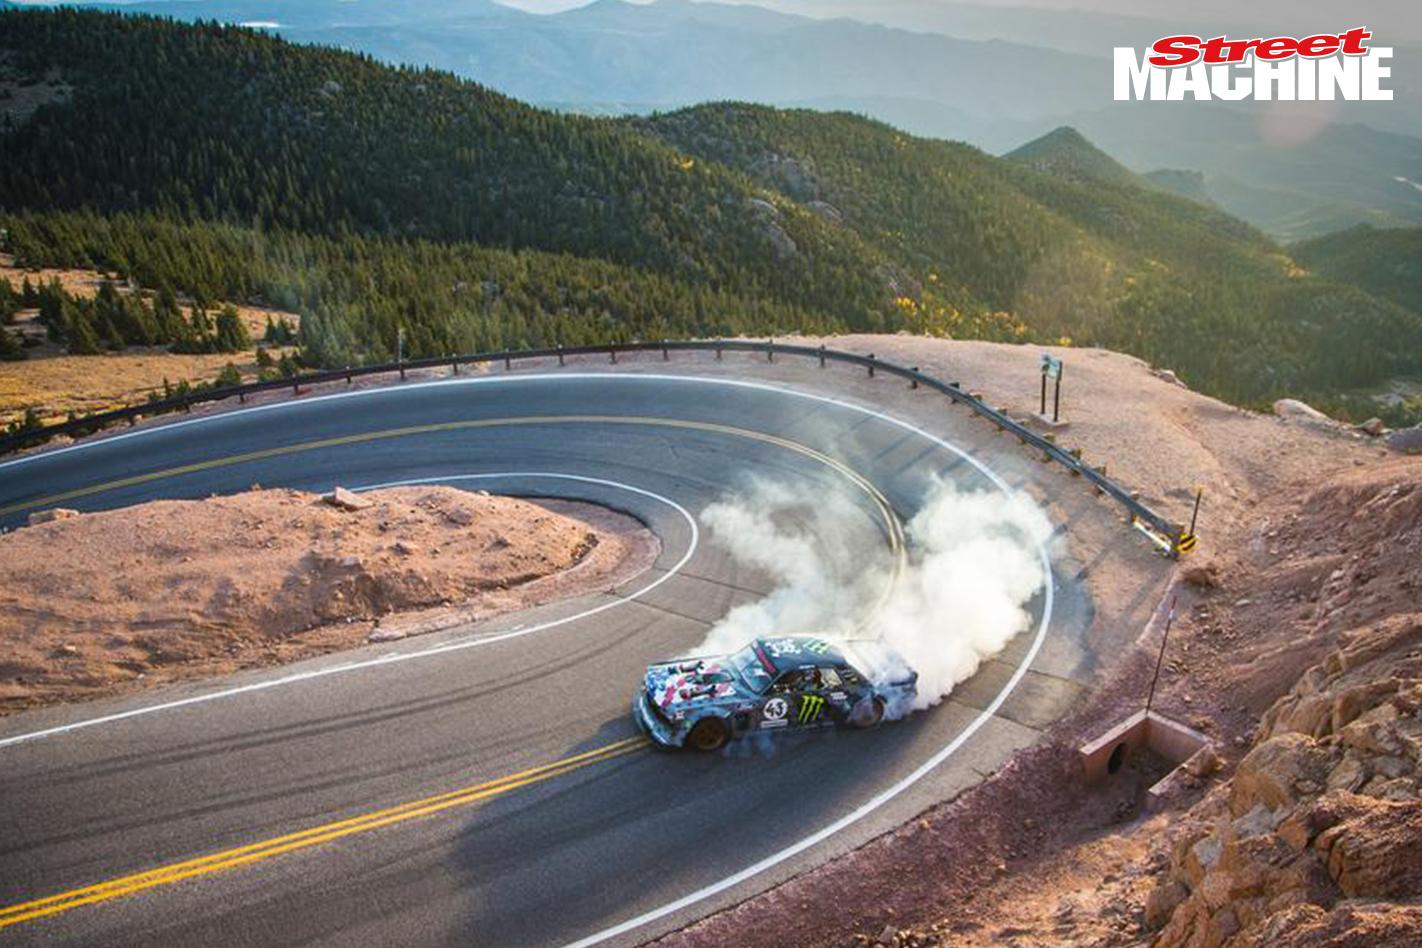 ken block tackles pikes peak in twin turbo all wheel drive mustang